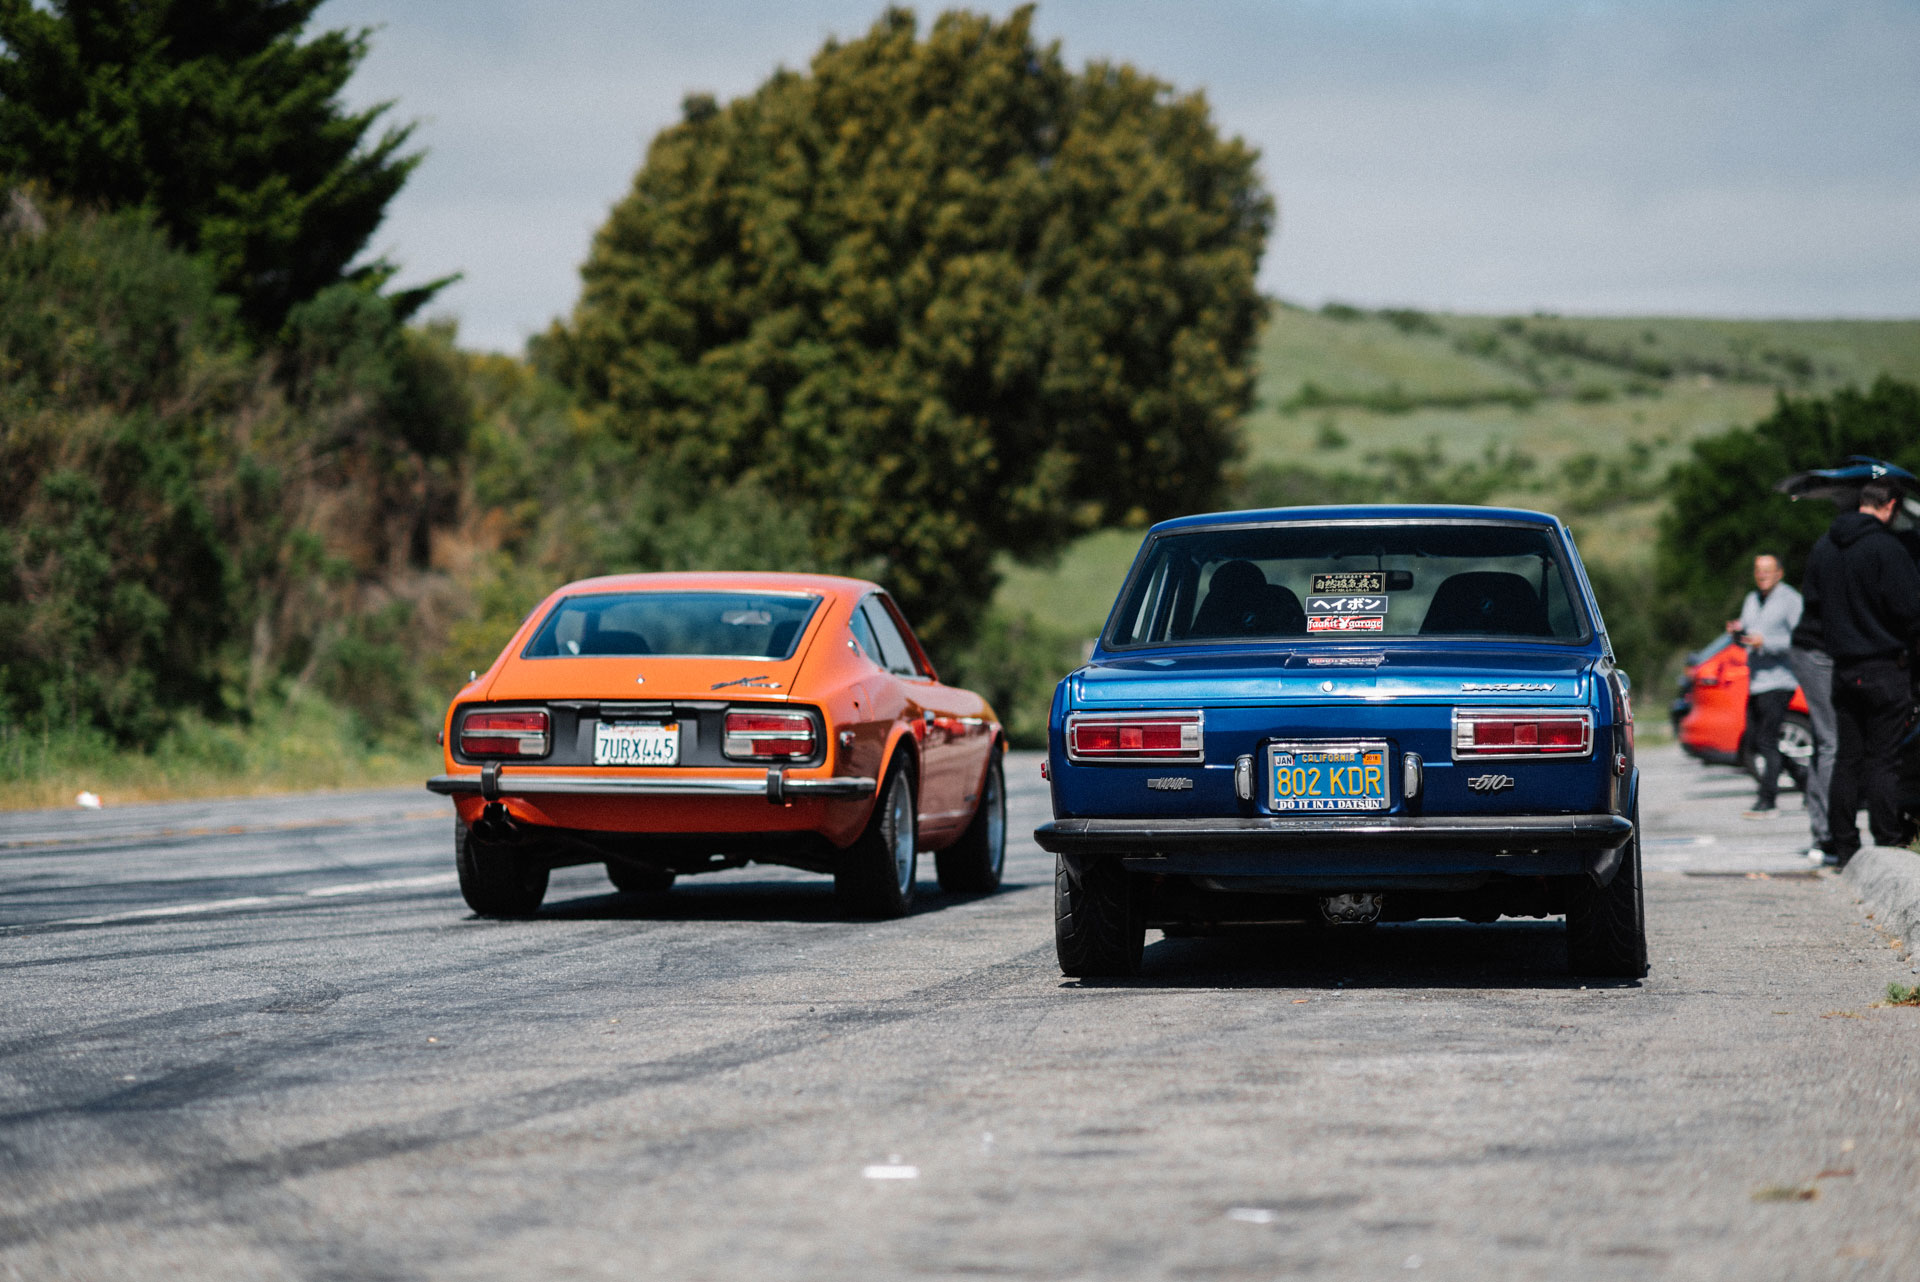 Datsun 510 and Datsun 240Z